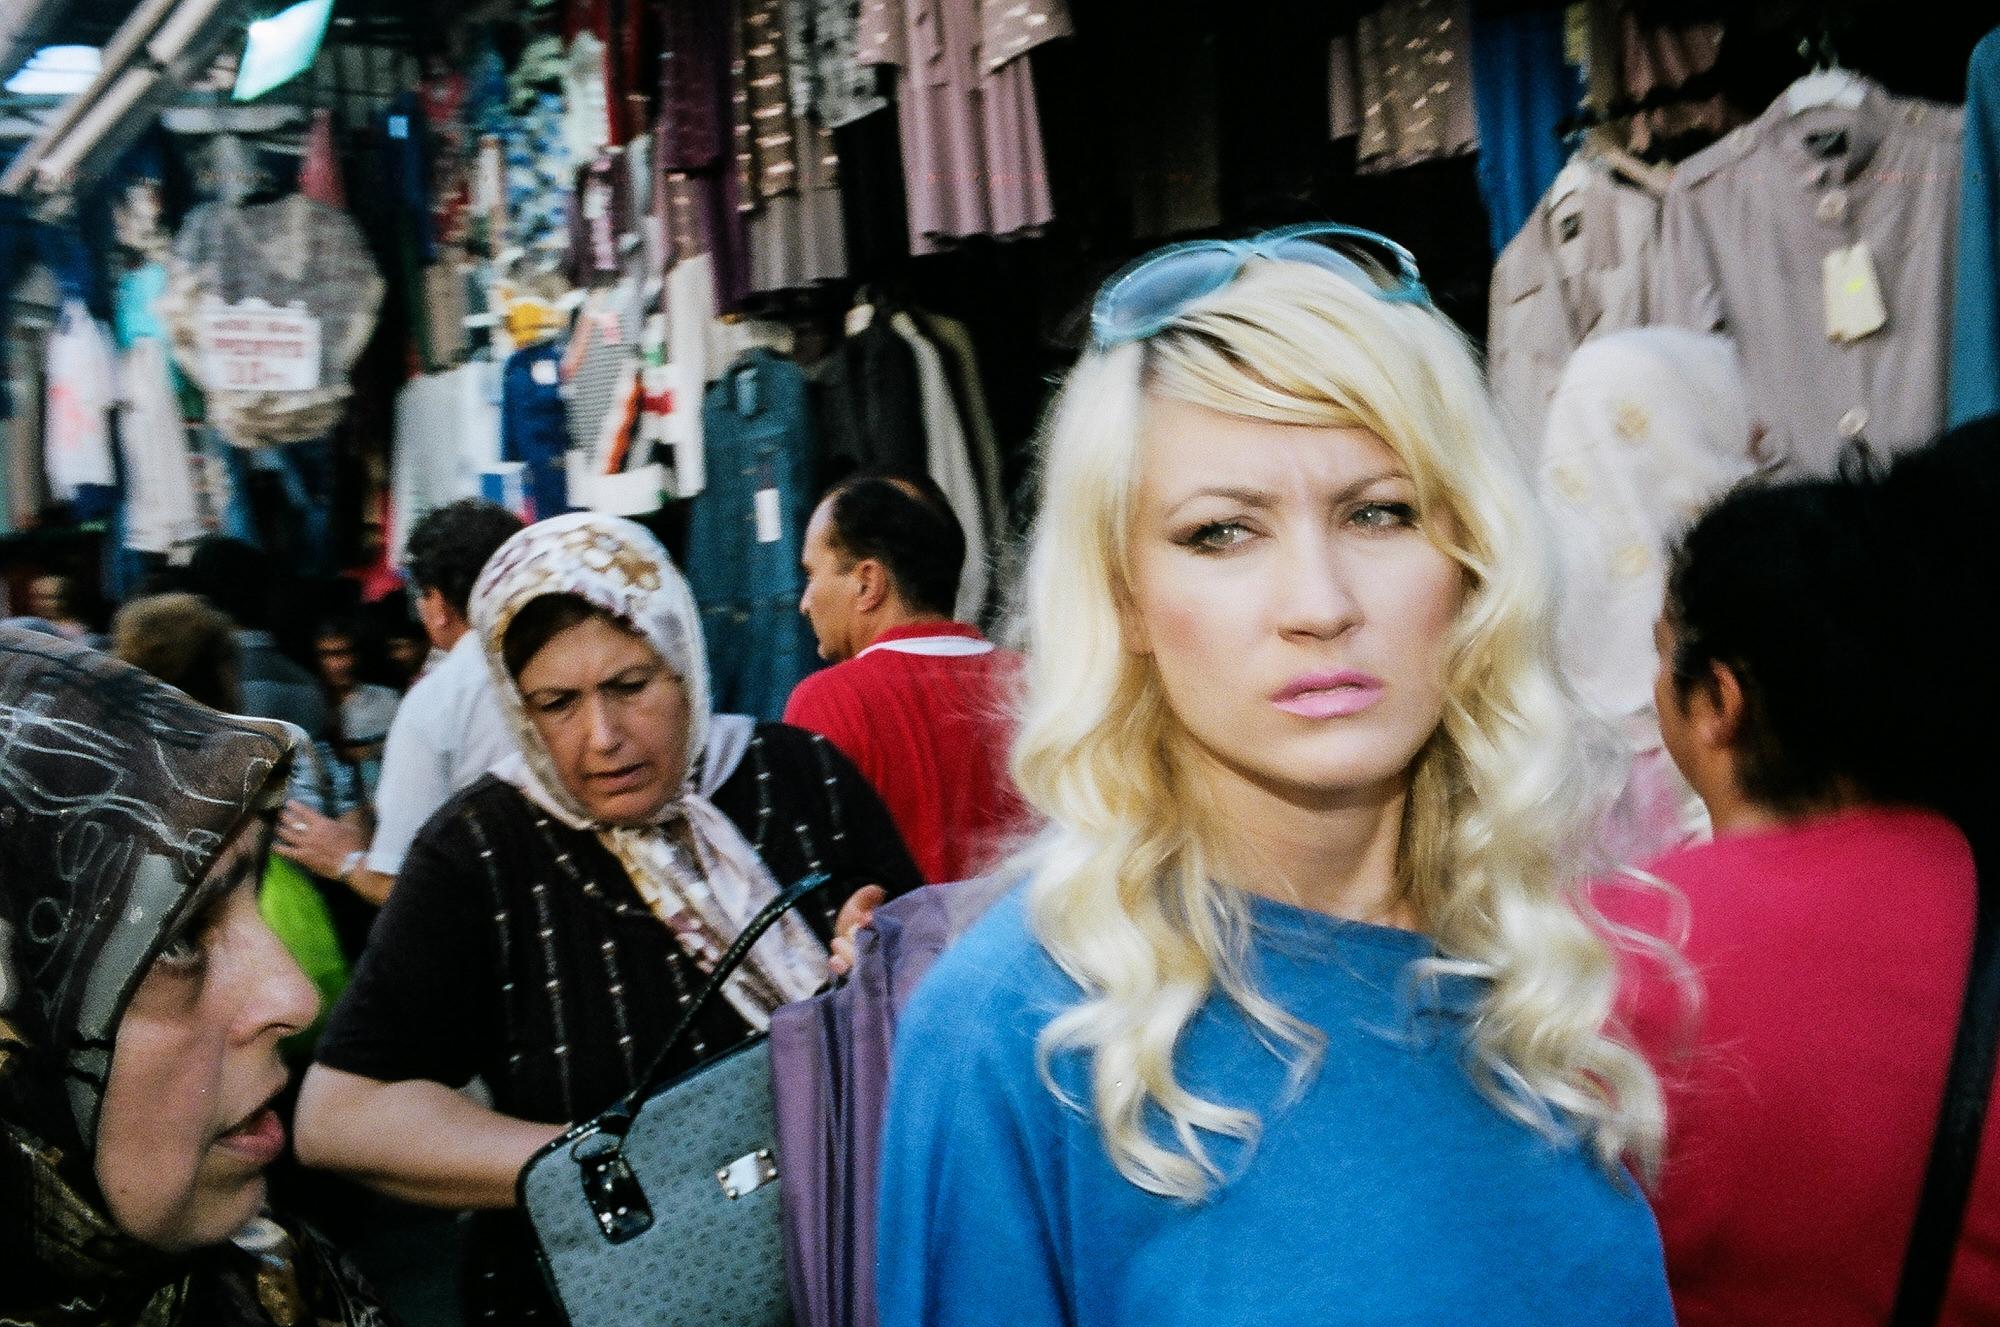 eric kim street photography istanbul - kodak portra 400 film 16